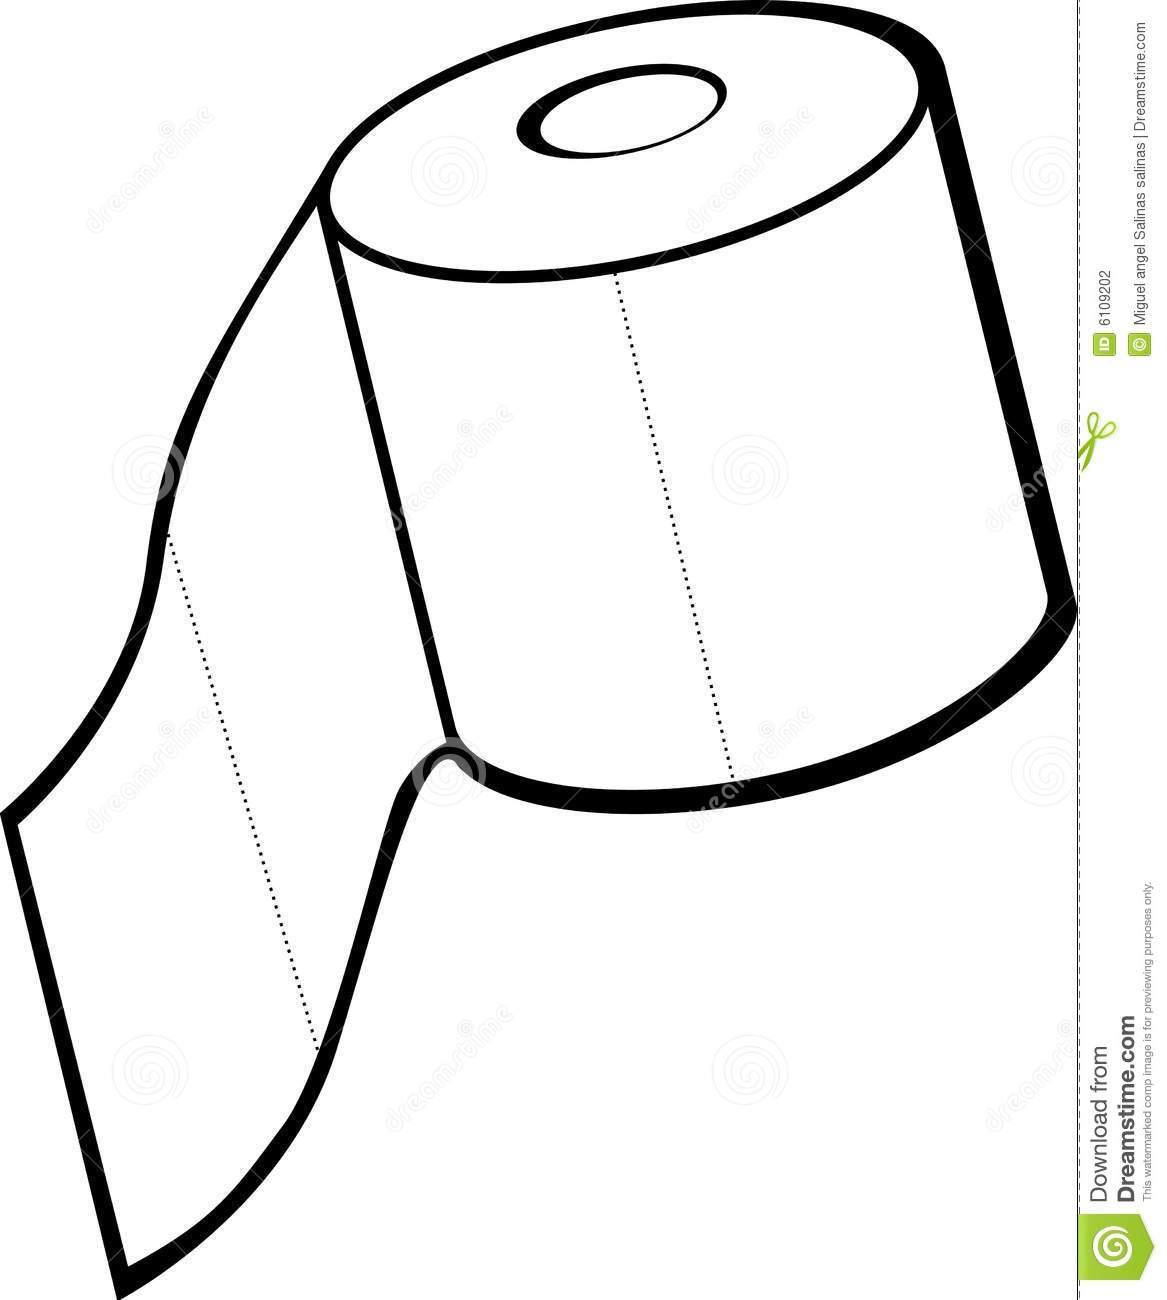 Toilet paper roll clipart 2 » Clipart Portal.